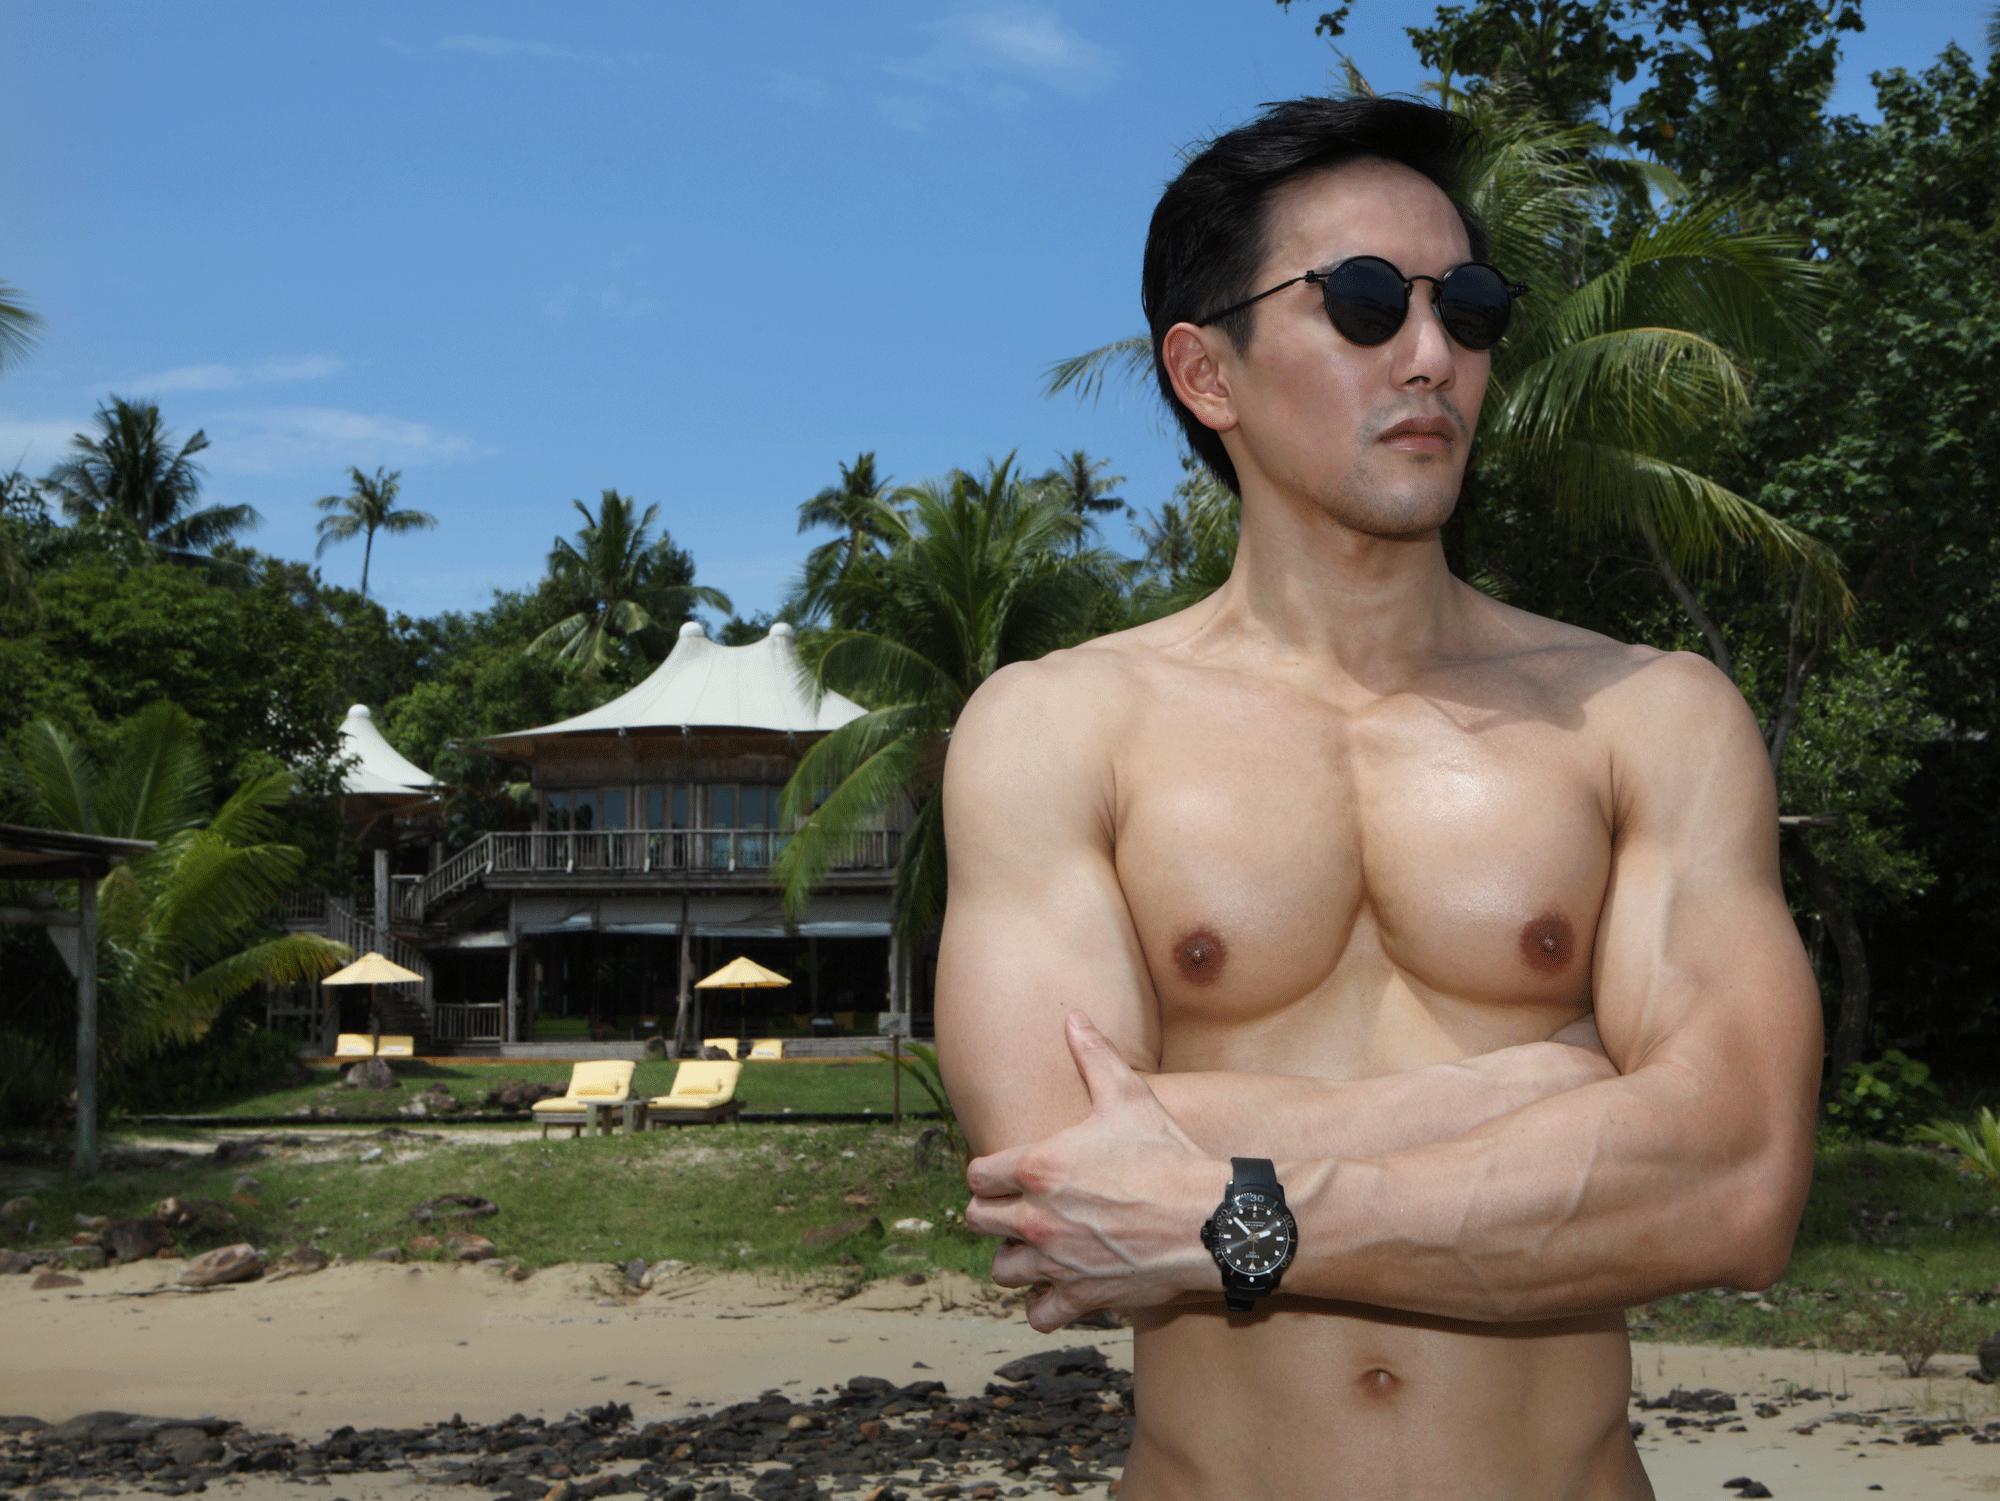 sunglasses : TAVAT  watch : TISSOT Seastar Powermatic 80